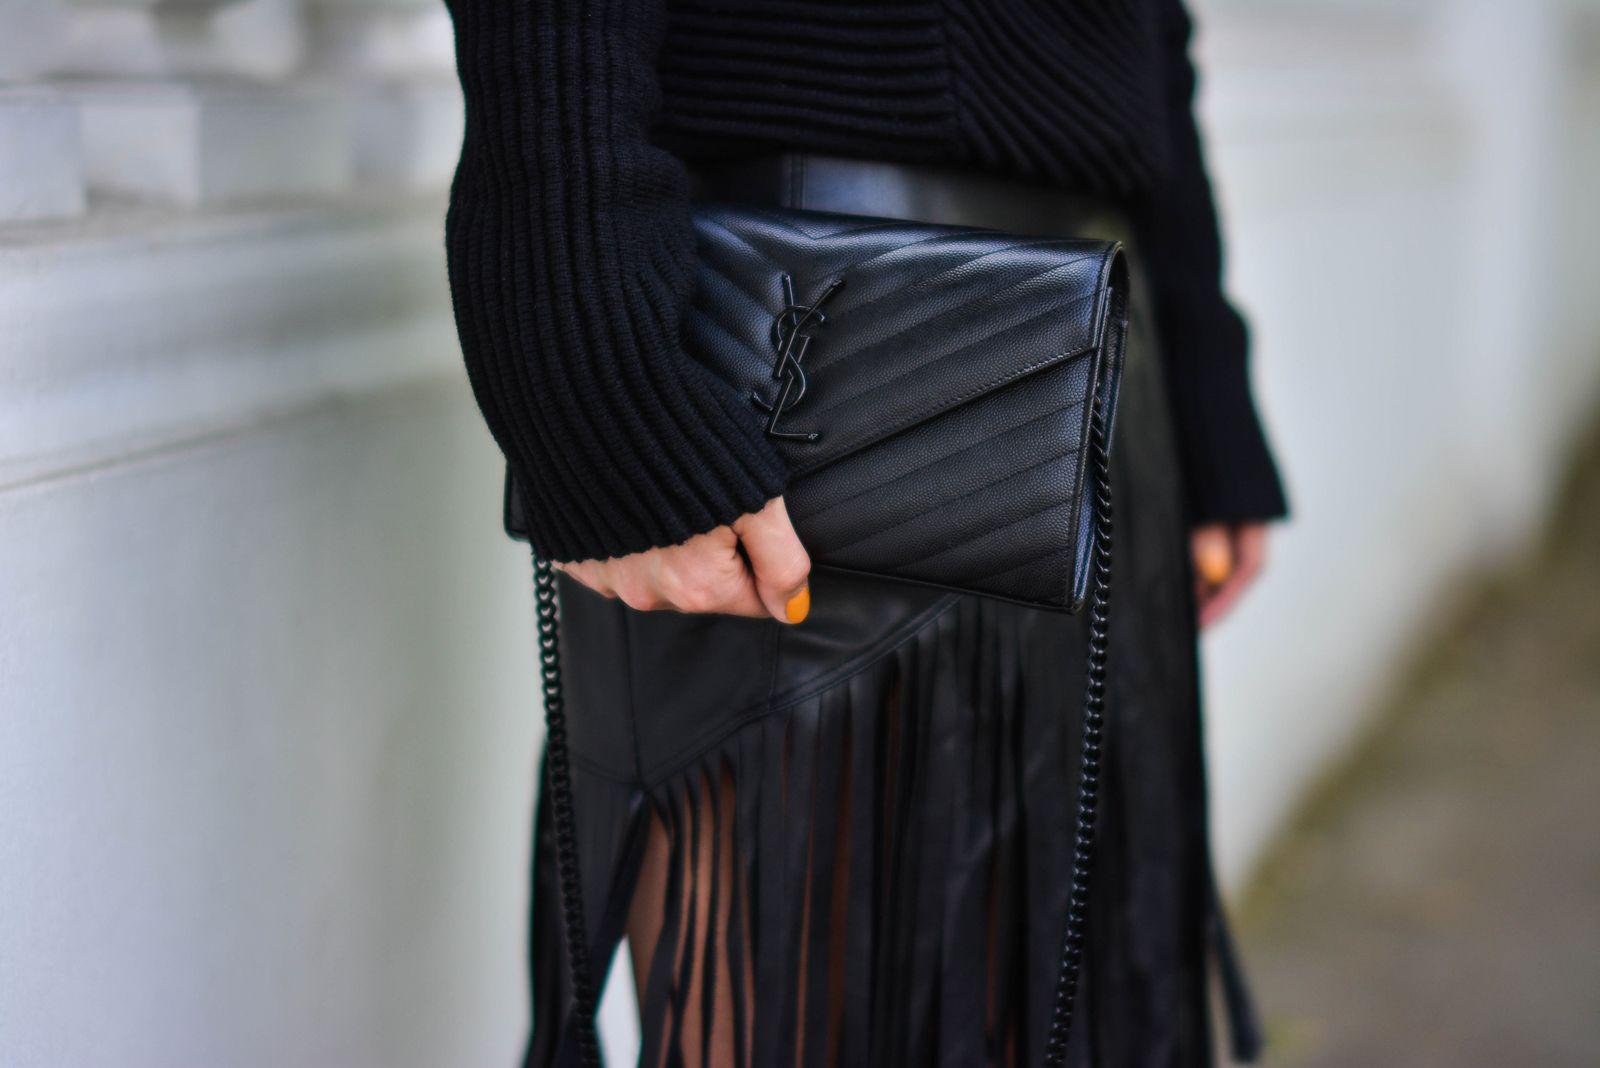 EJSTYLE-Emma-Hill-wears-River-Island-faux-leather-fringe-tassel-skirt-Romwe-black-jumper-YSL-quilted-envelope-clutch-bag-all-black-outfit